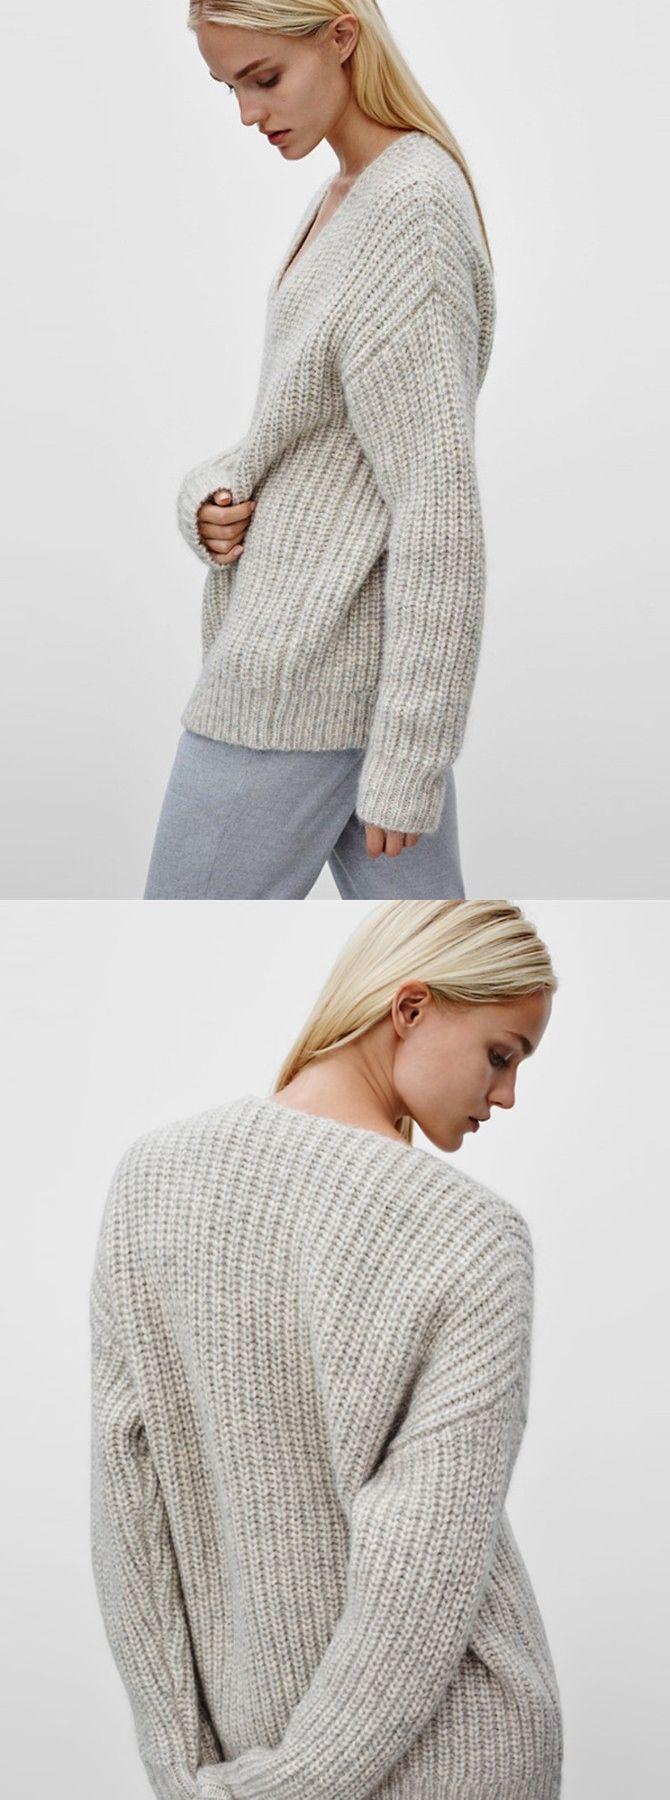 V-neck Cotton Medium Ivory Fluffy Plian Sweater | Ivory, Simple ...